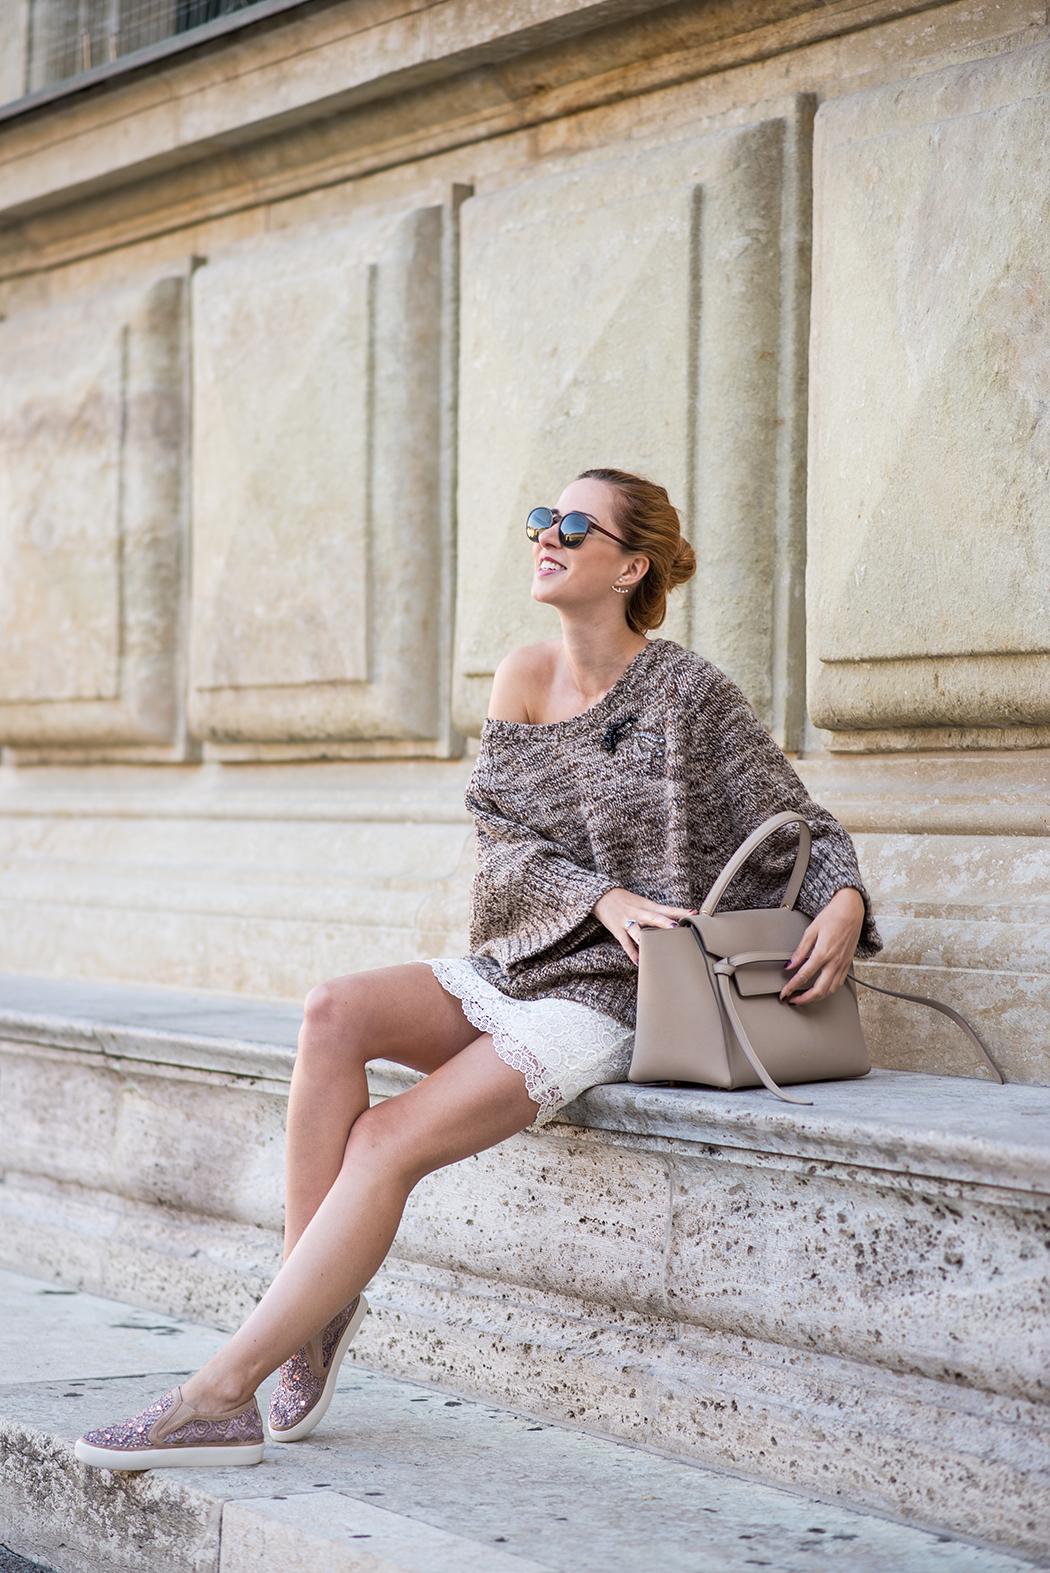 Fashionblog-Fashionblogger-München-Deutschland-Fashion-Blog-Lifestyle-Lindarella-Linda-Rella-Céline_belt_bag-Celine-Tasche-Nude-beige-4-web